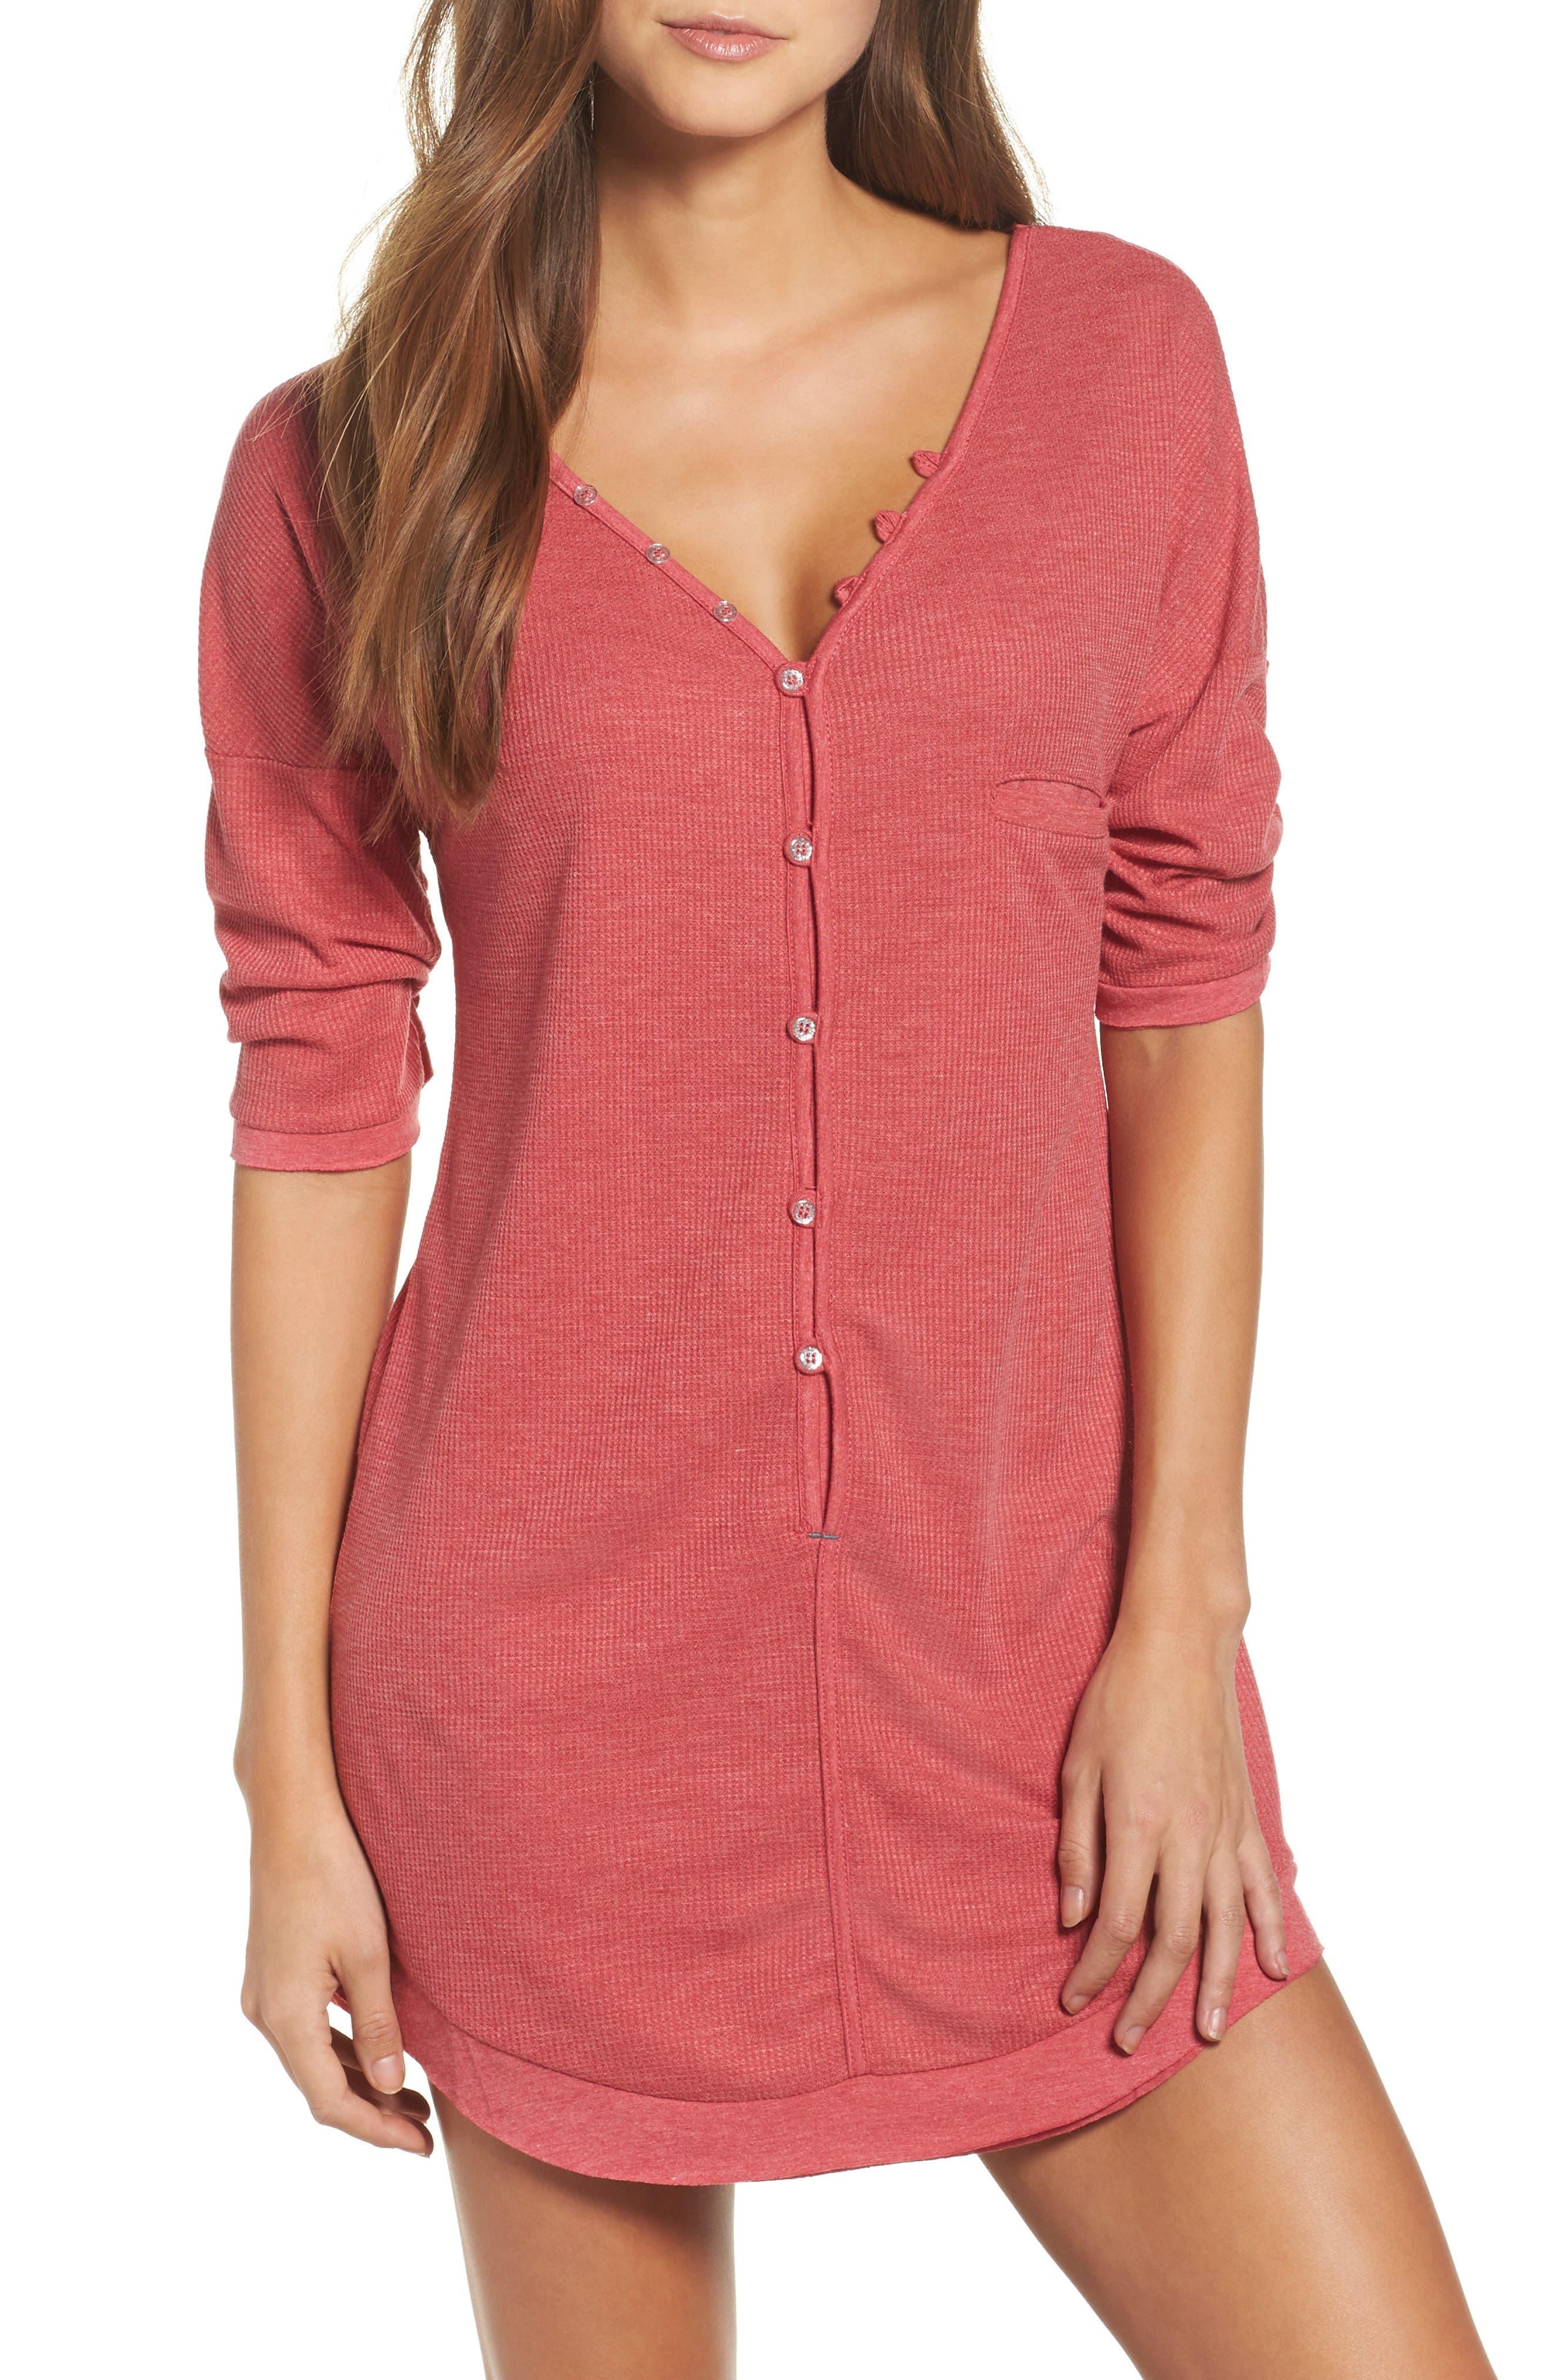 Main Image - Honeydew Intimates Sleep Shirt